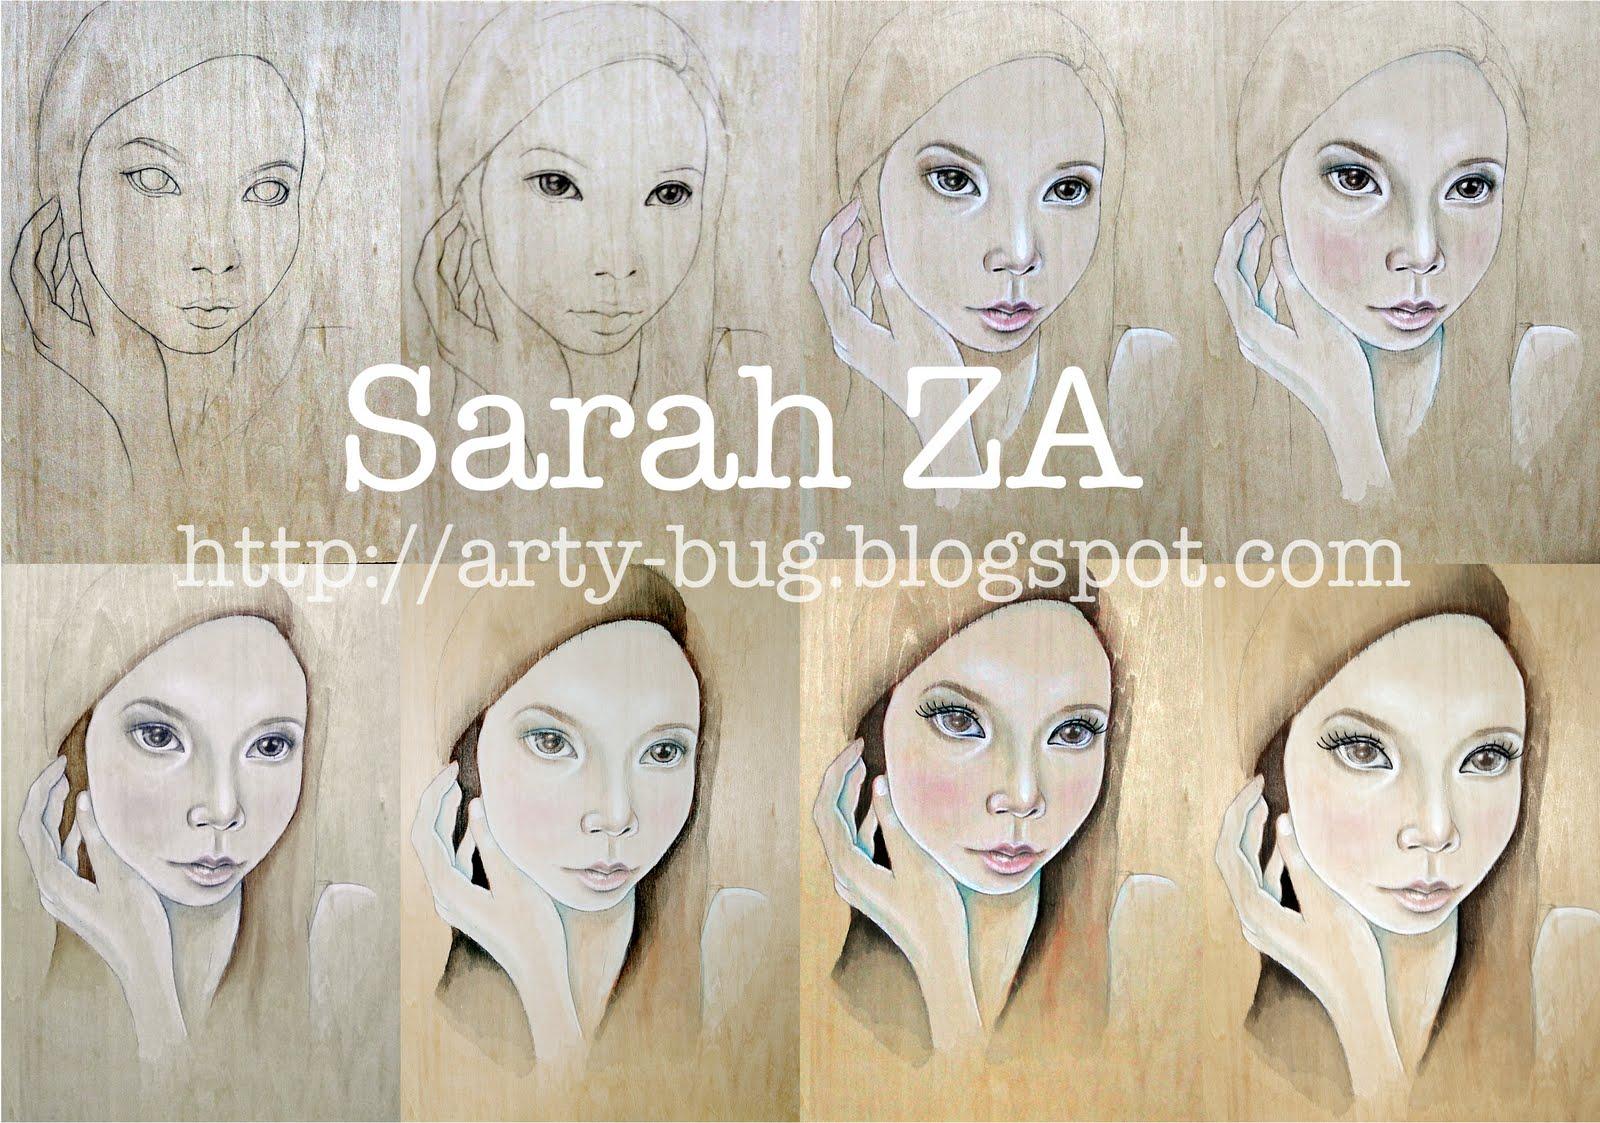 [Wood_painting_process_arty-bug_SarahZA]